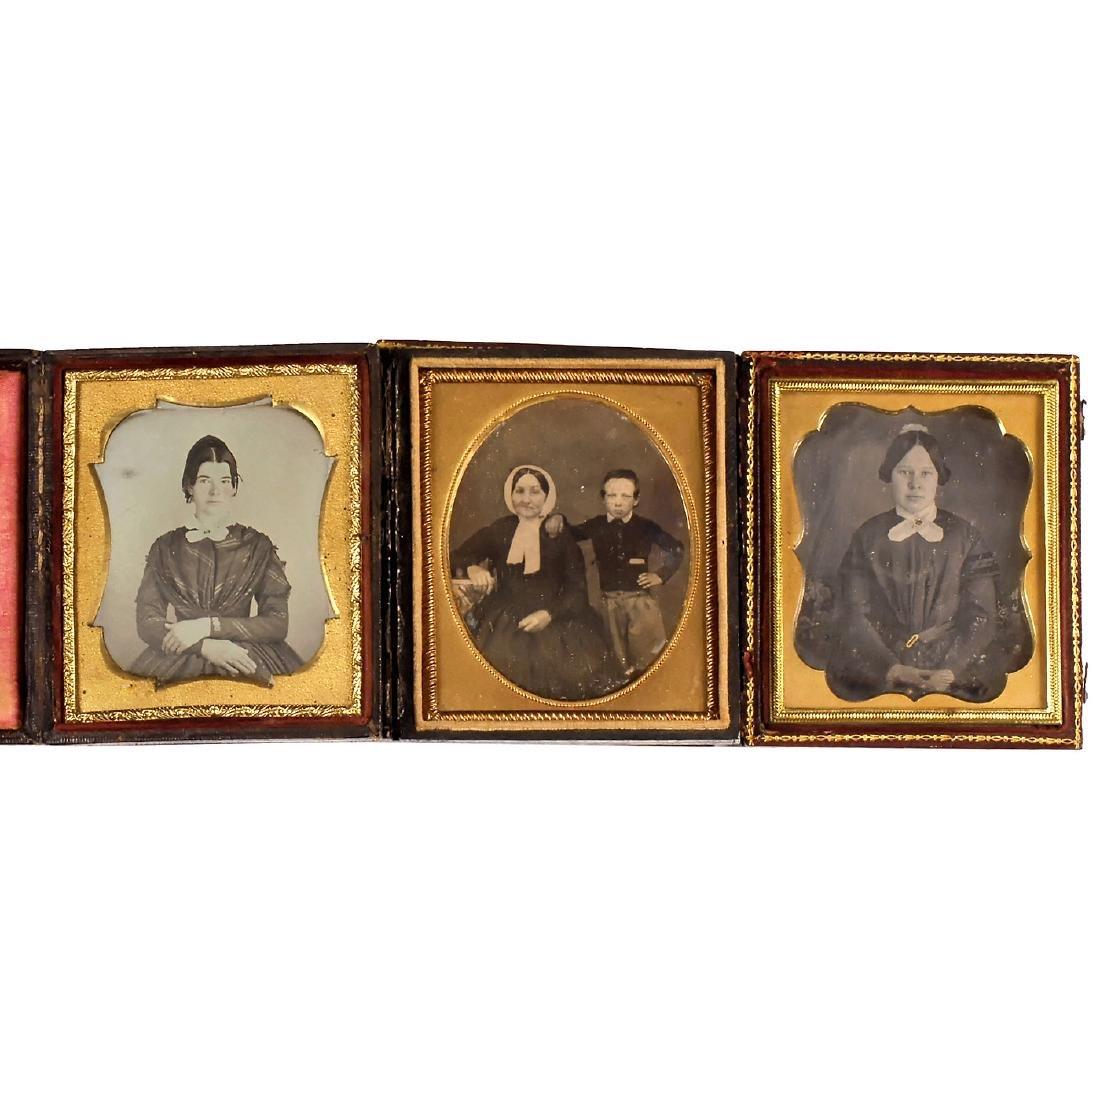 3 Daguerreotypes (1/8 Plates), c. 1845-50